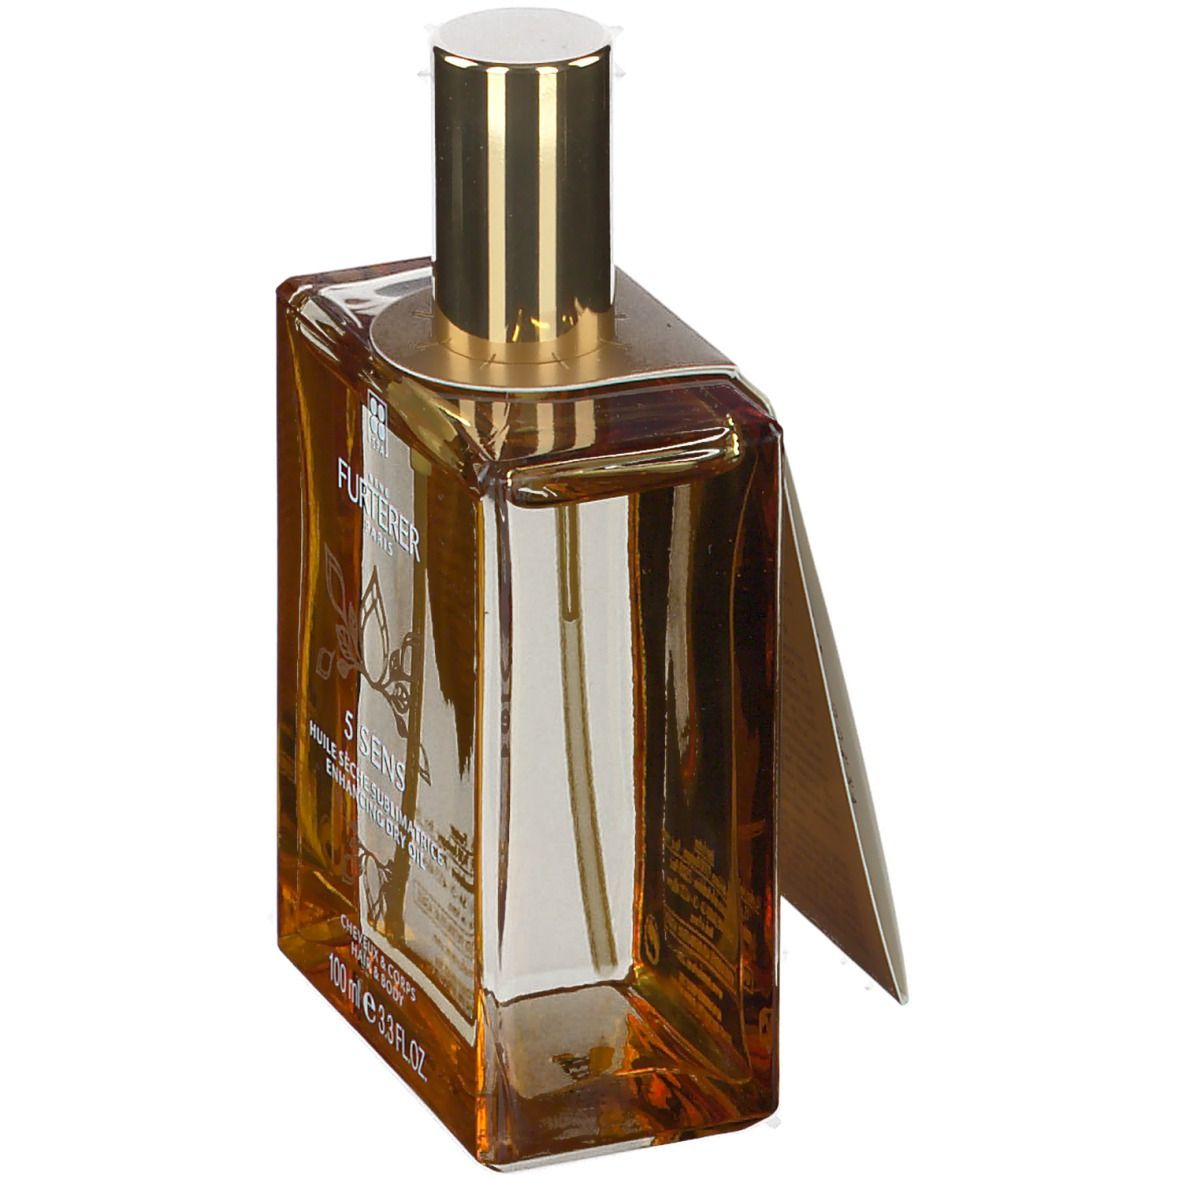 RENE FURTERER 5 SENS luxuriöses Trockenöl